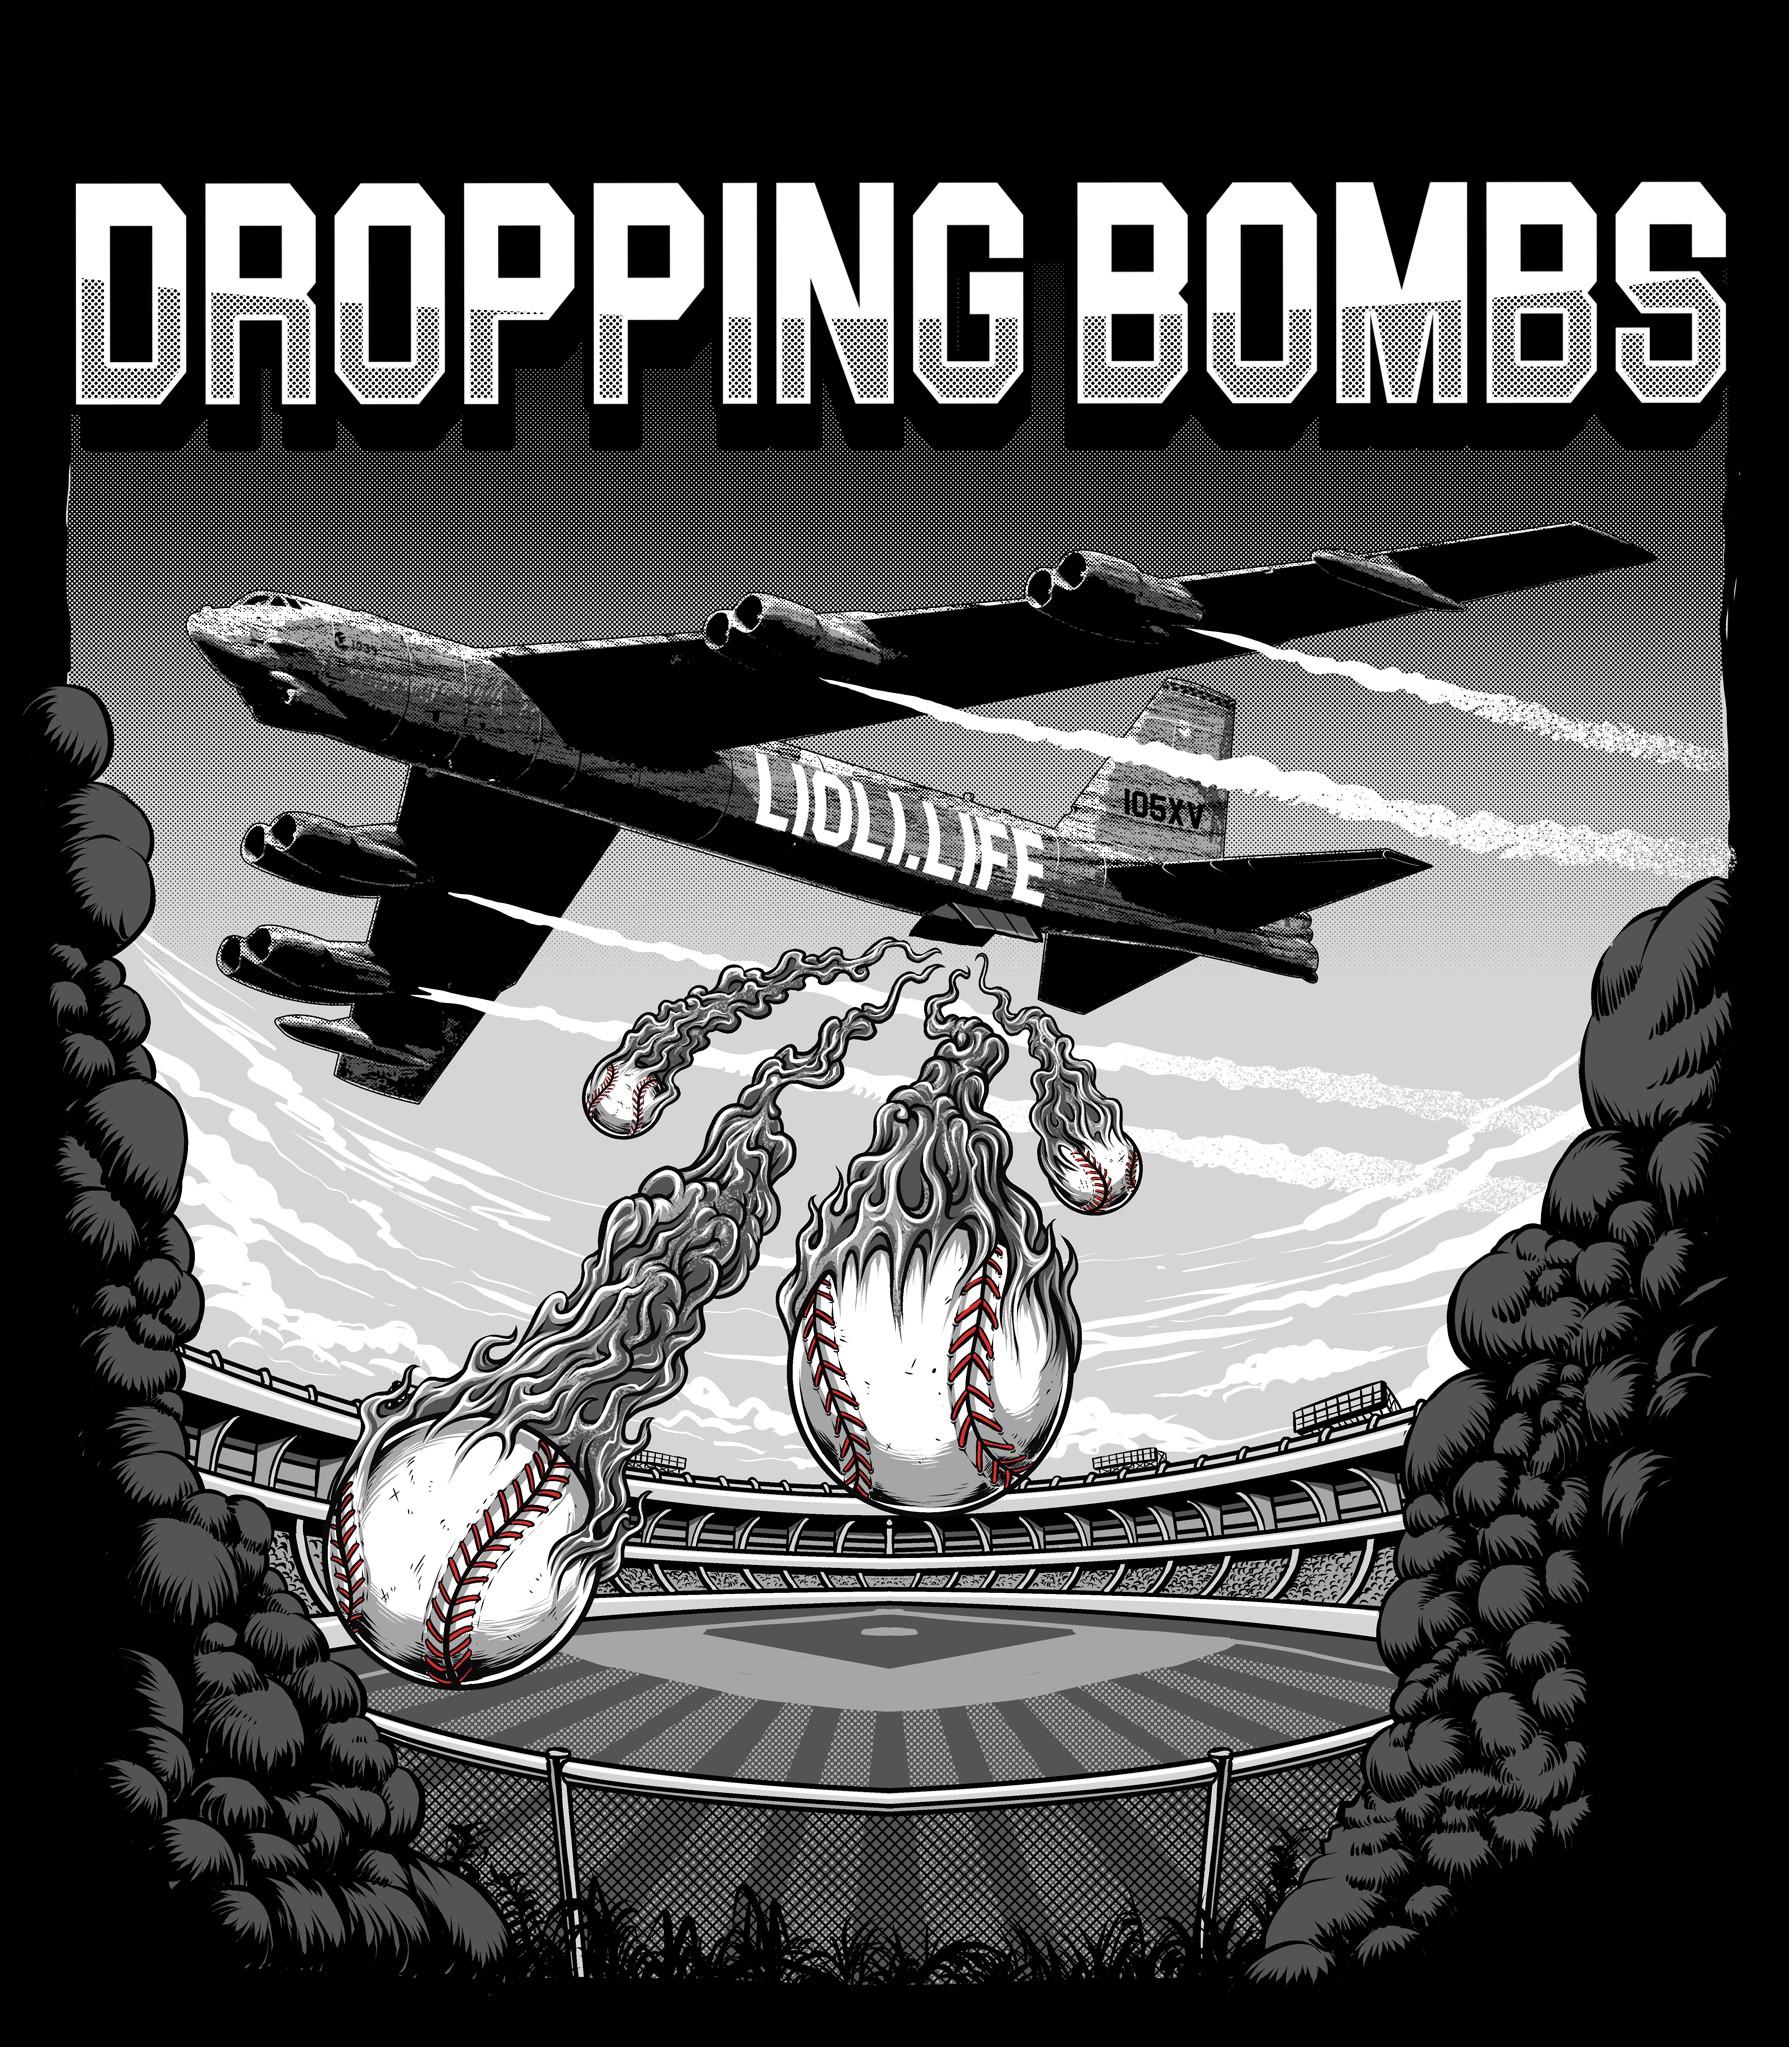 Baseball Theme T Shirt Graphic of B-52 Bomber Airplane dropping Baseballs as Bombs